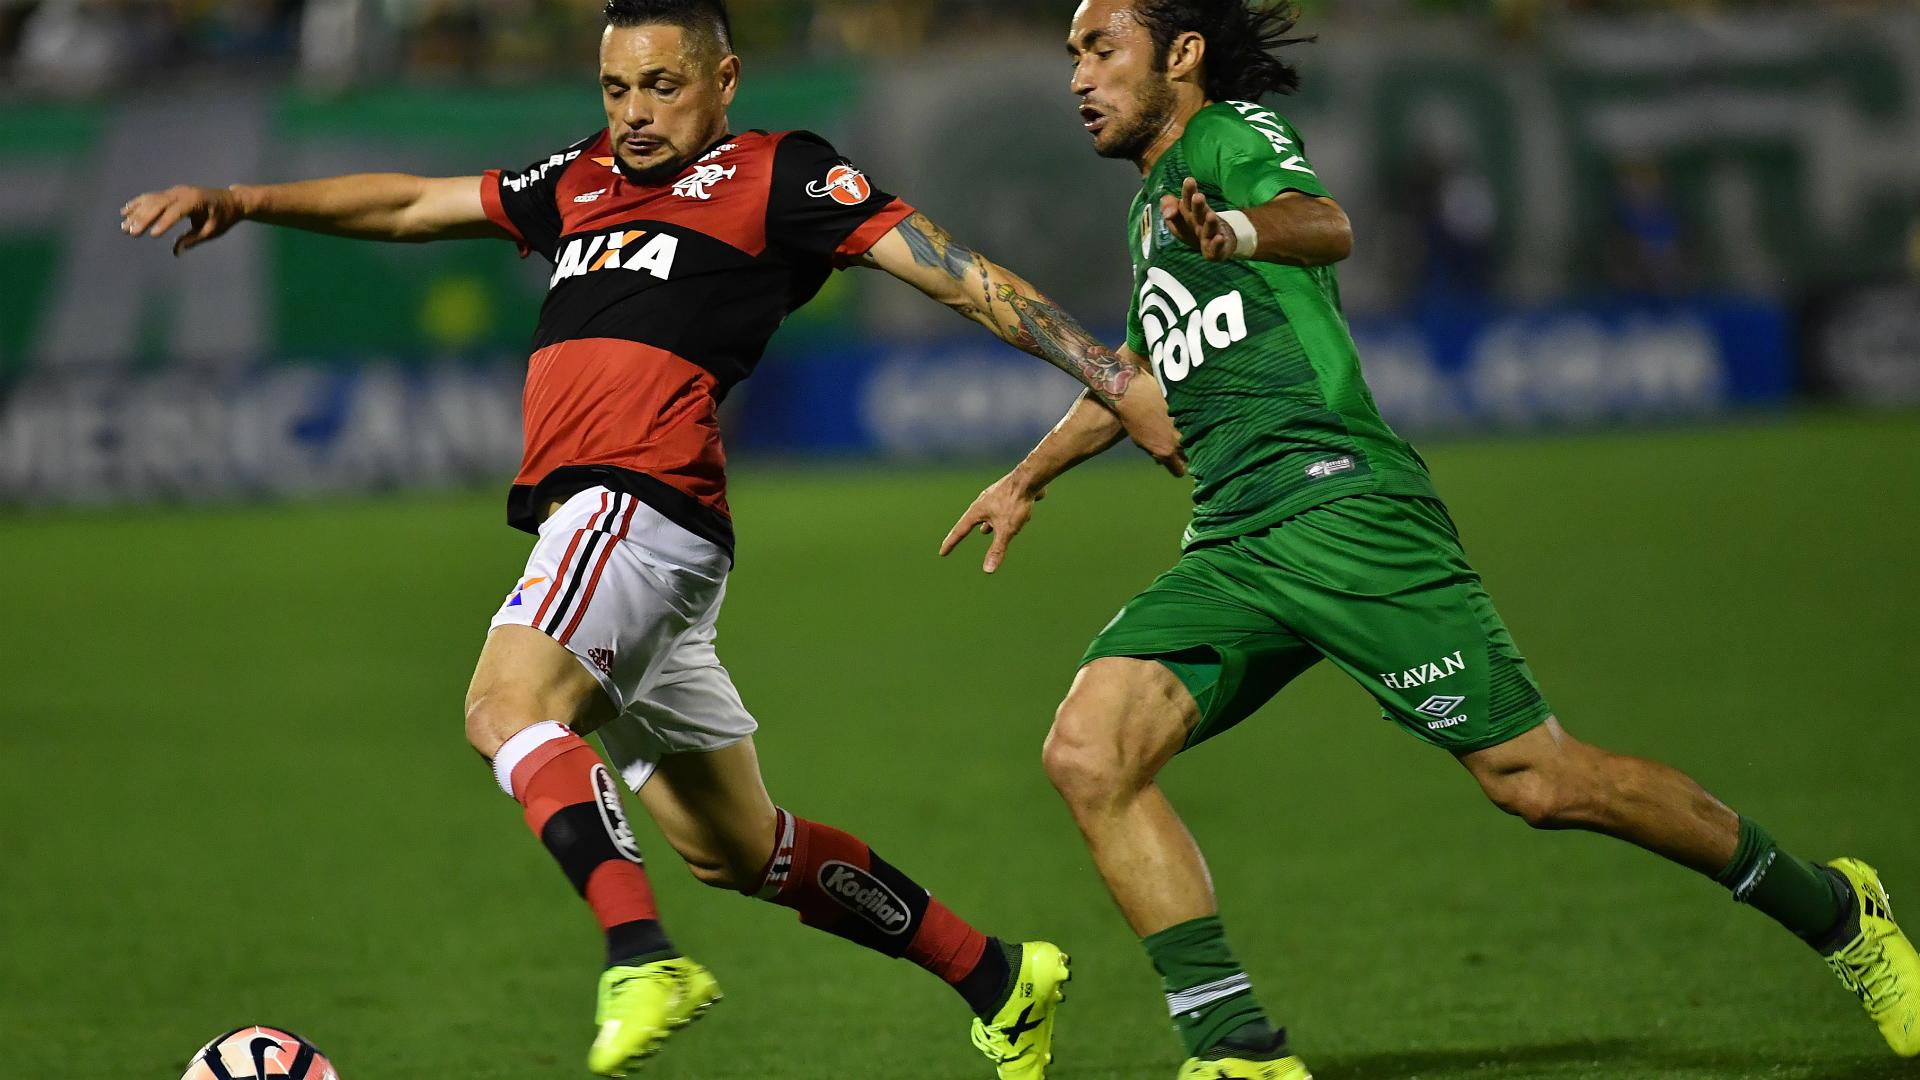 Pará Apodi I Flamengo Chapecoense I 13 09 17